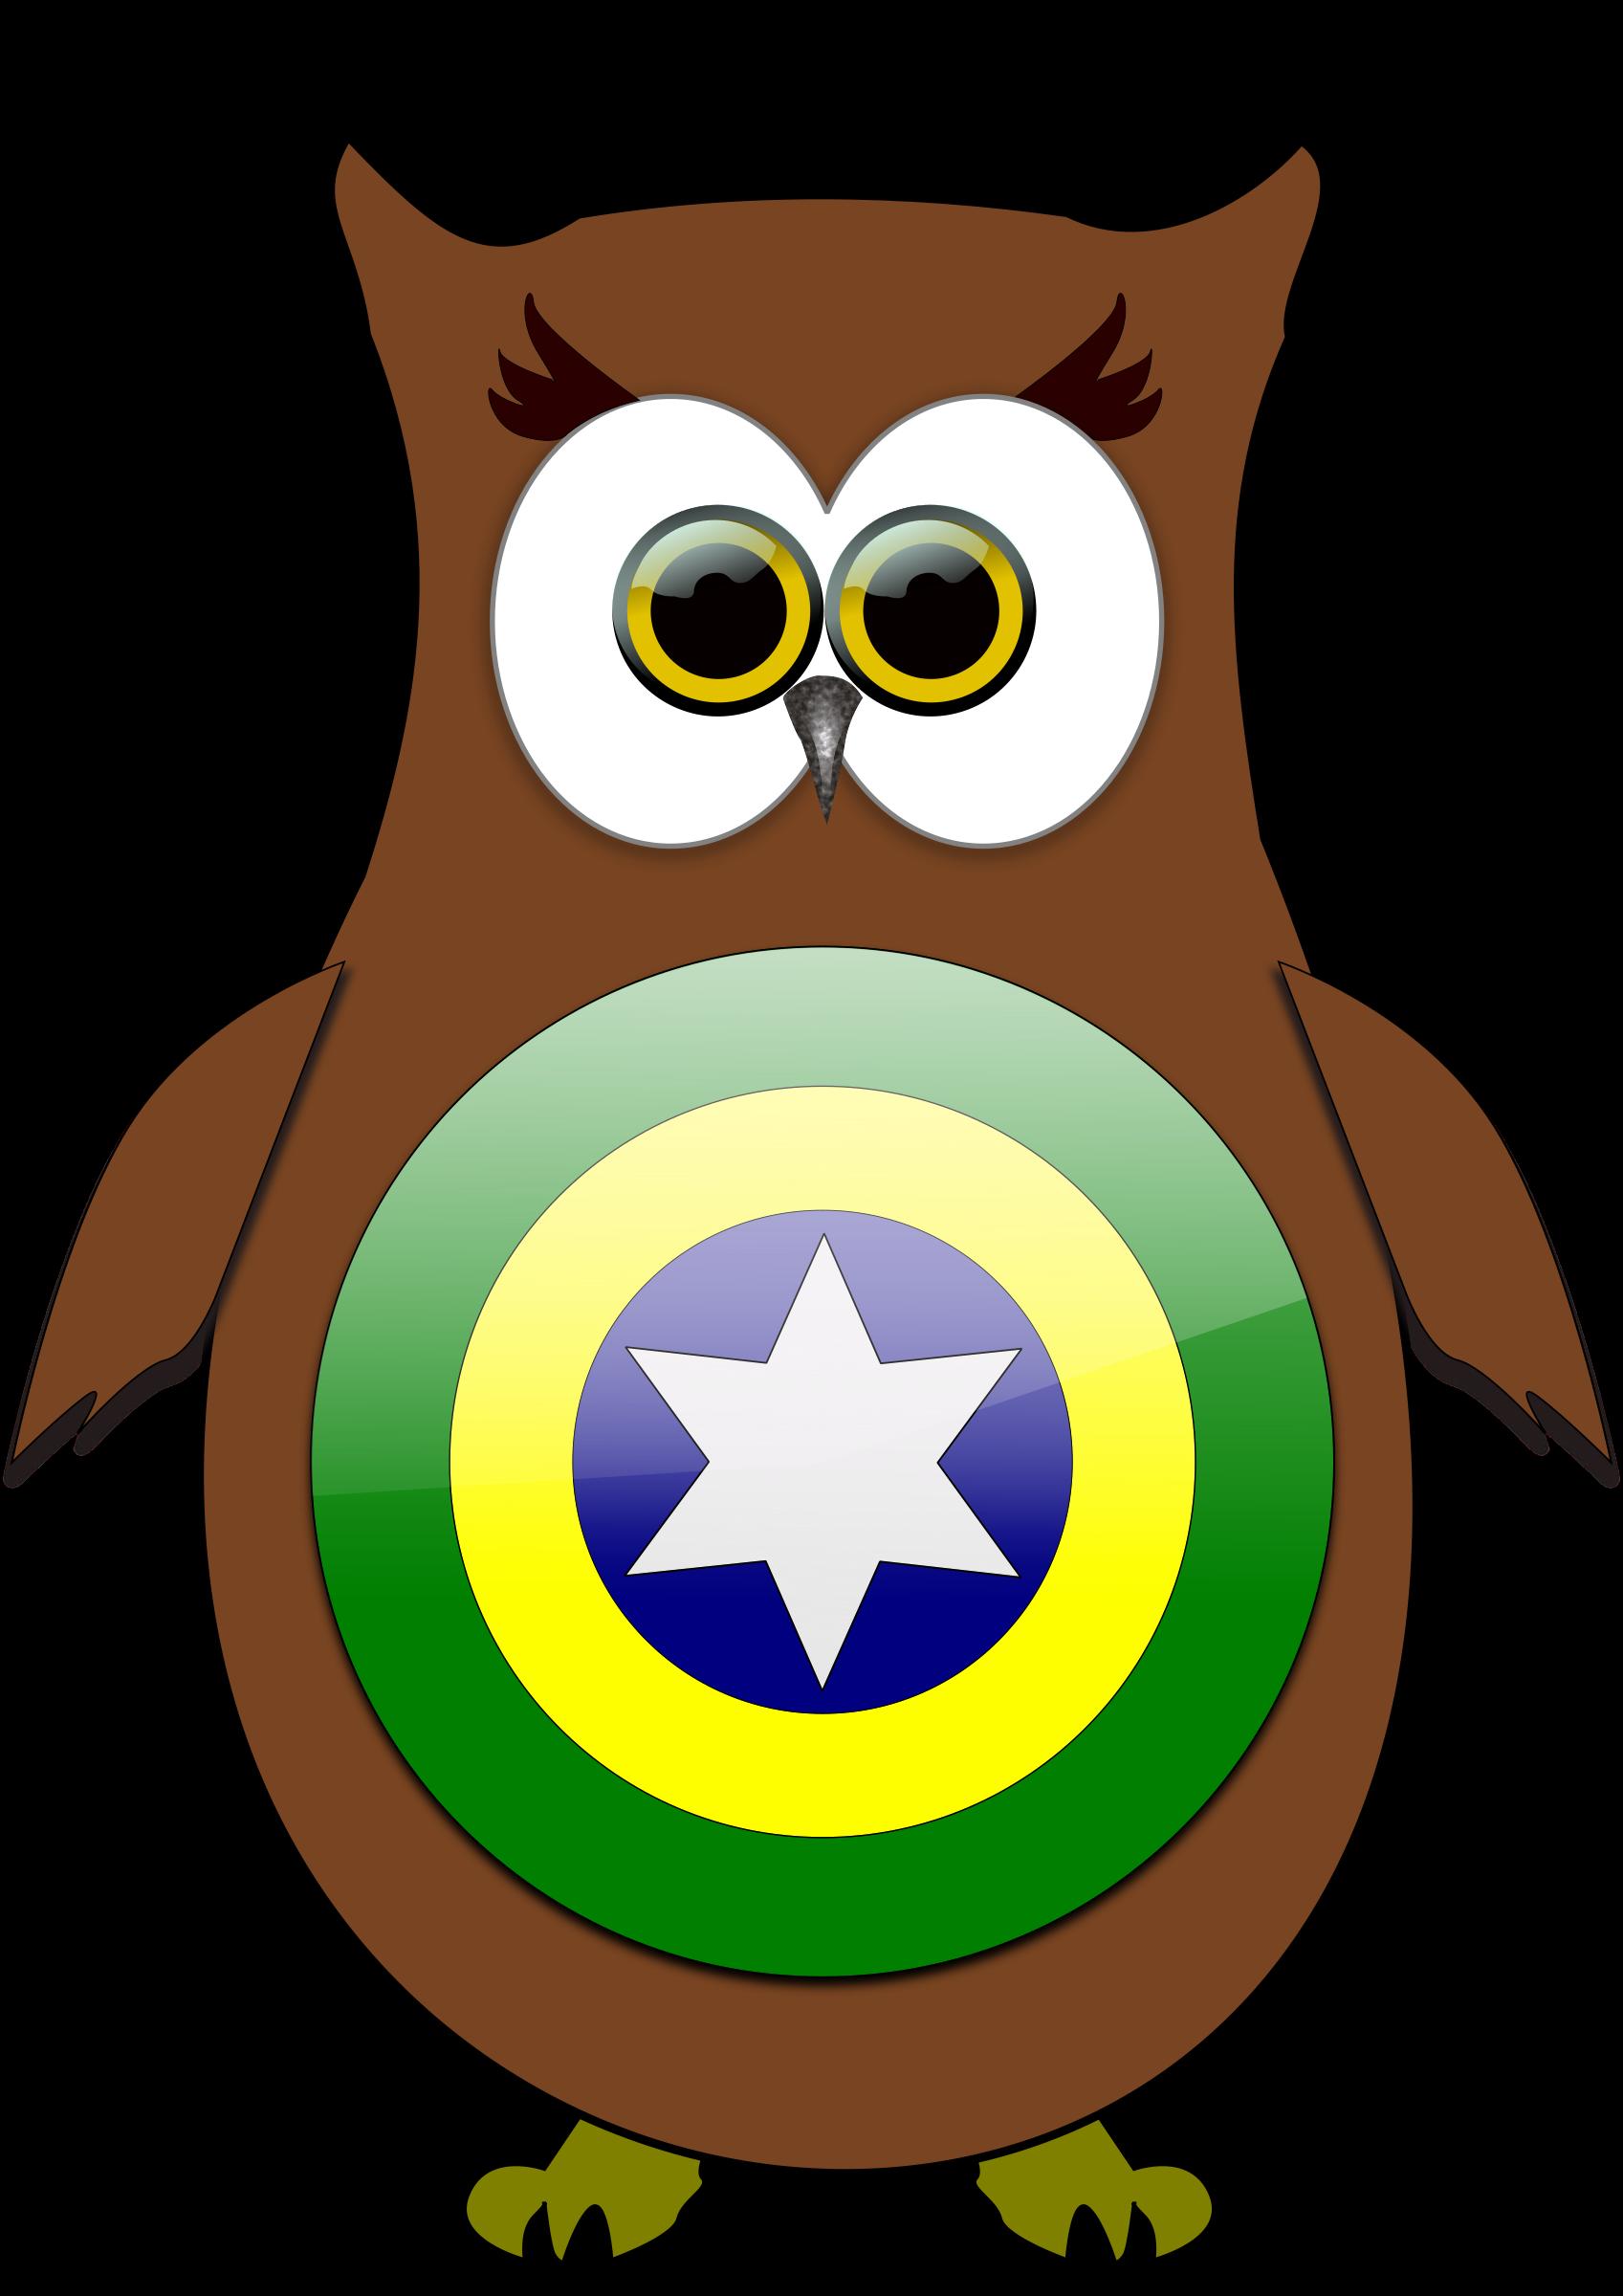 Brazil owl big image. Hero clipart animal